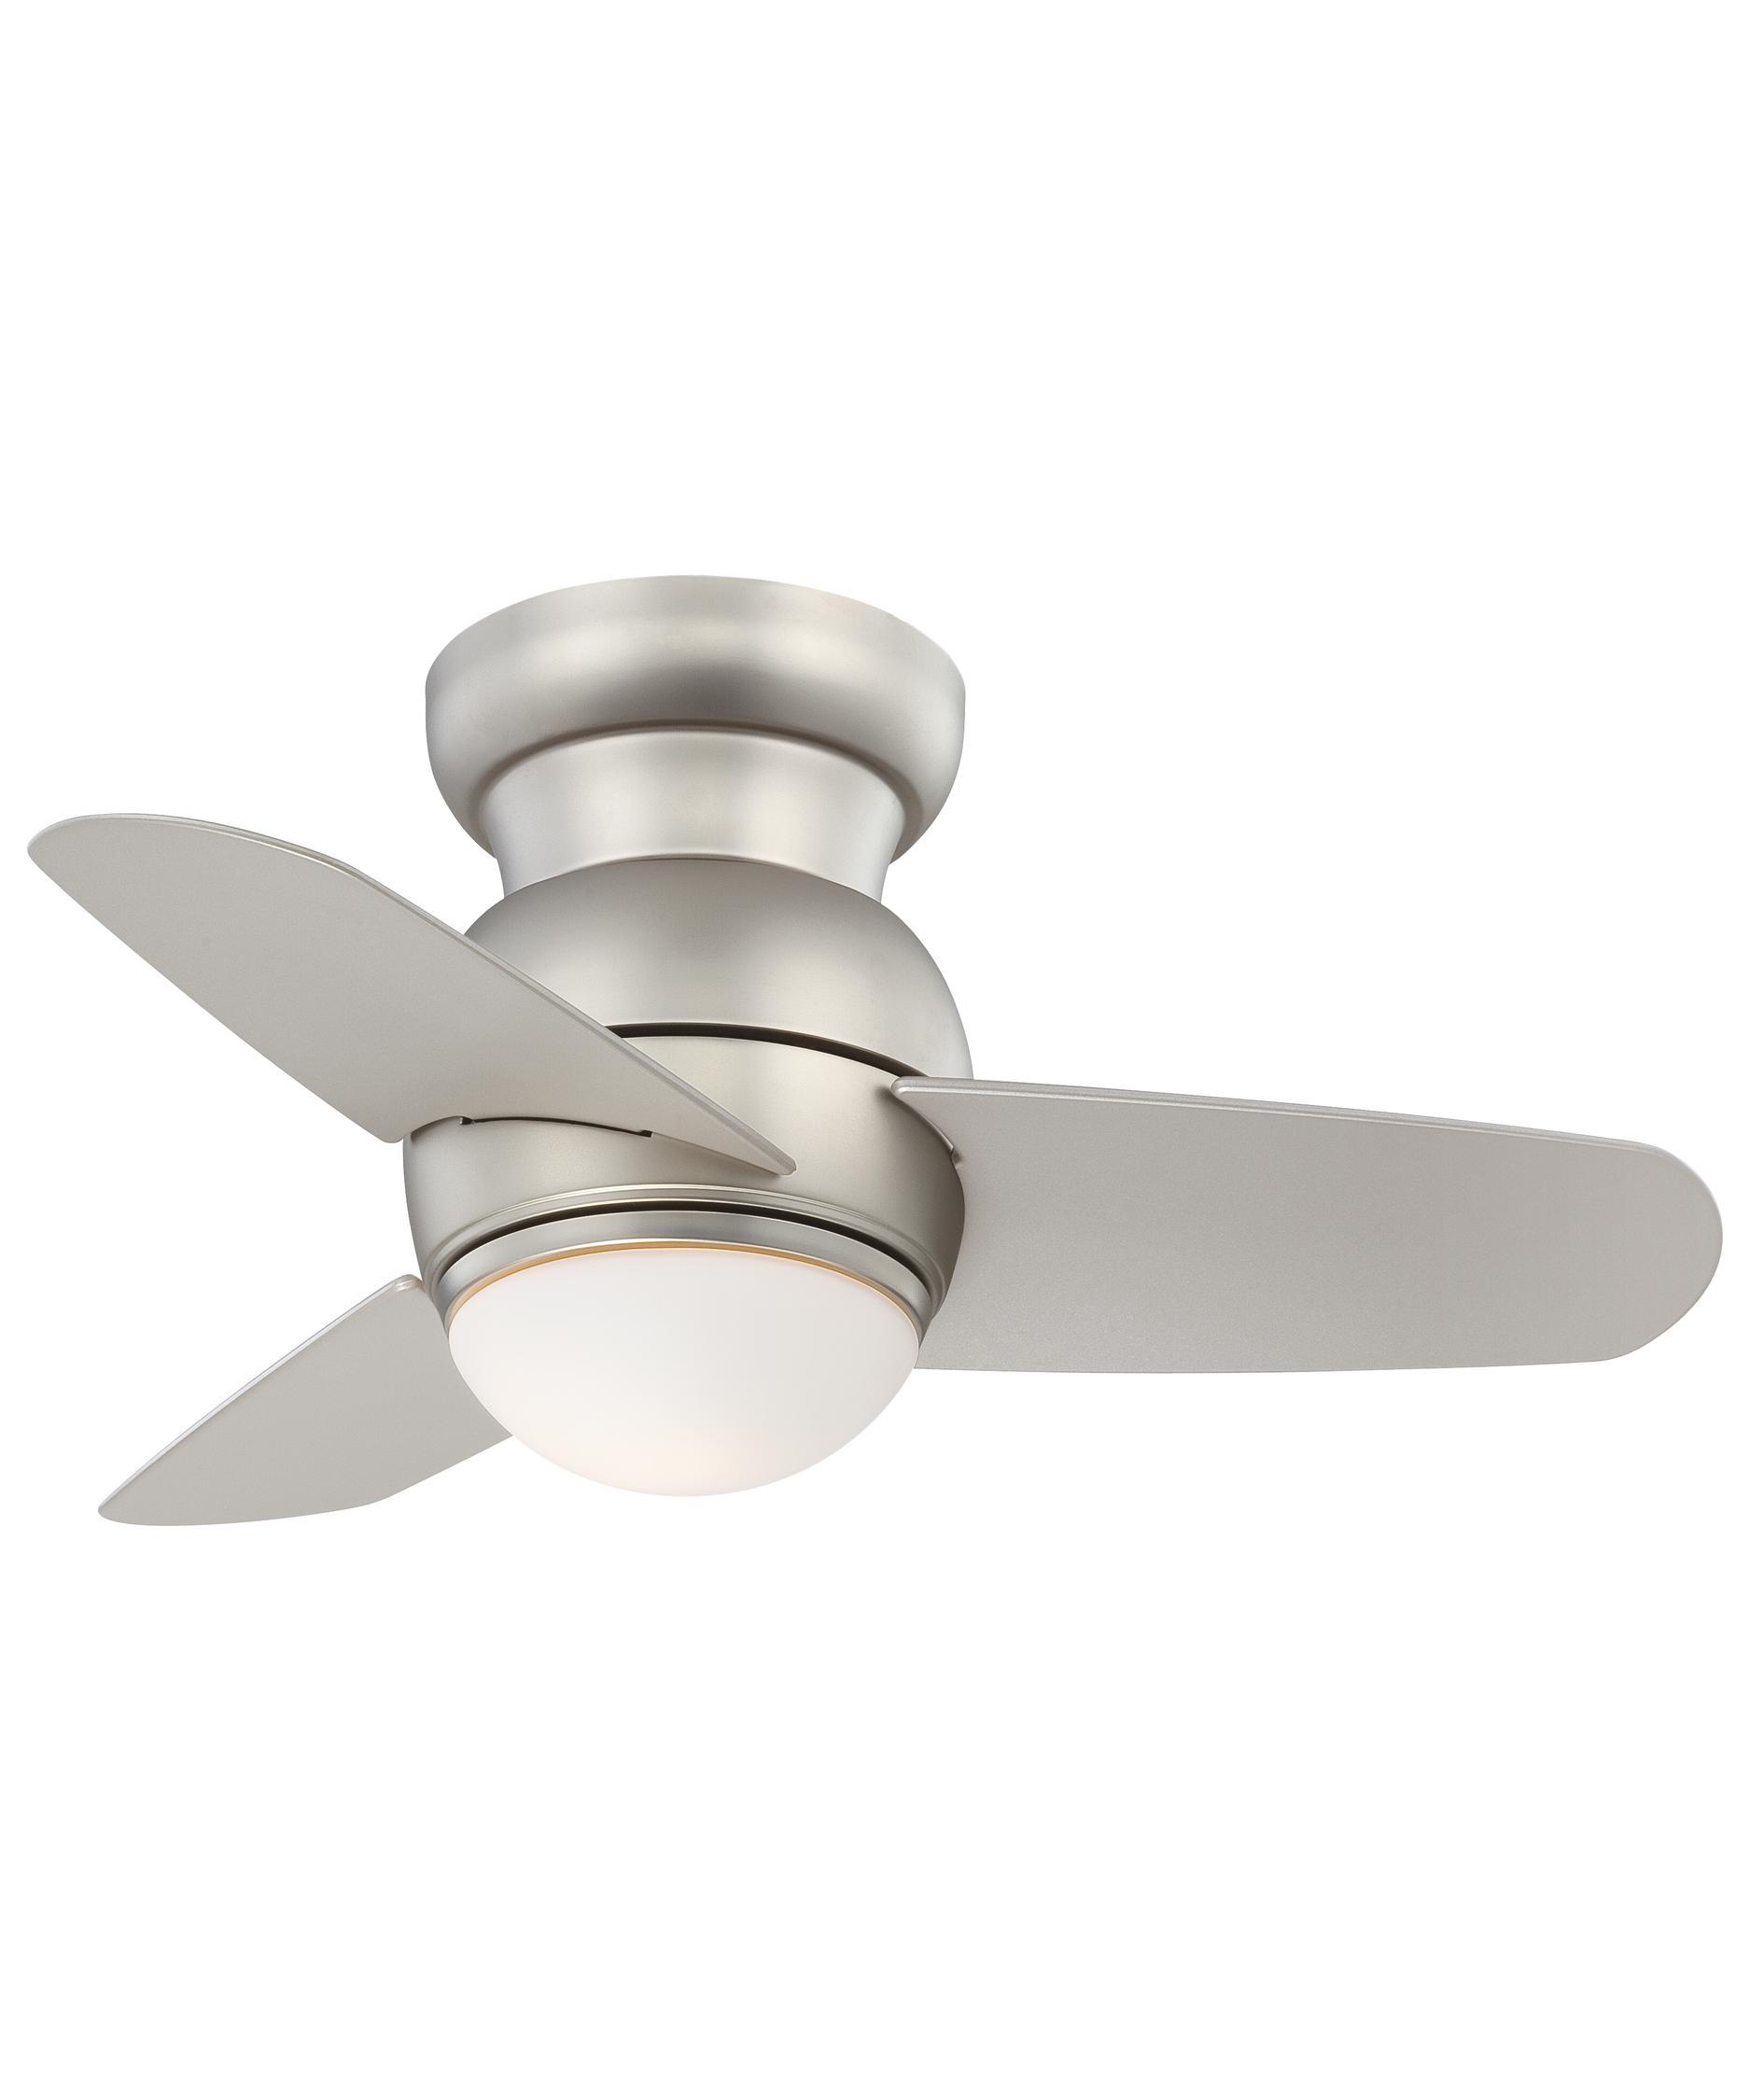 Flush Mount Ceiling Fans, Hugger Ceiling Fans, Low Profile Fans ...:Spacesaver 26 Inch 3 Blade Flush Mount Fan,Lighting